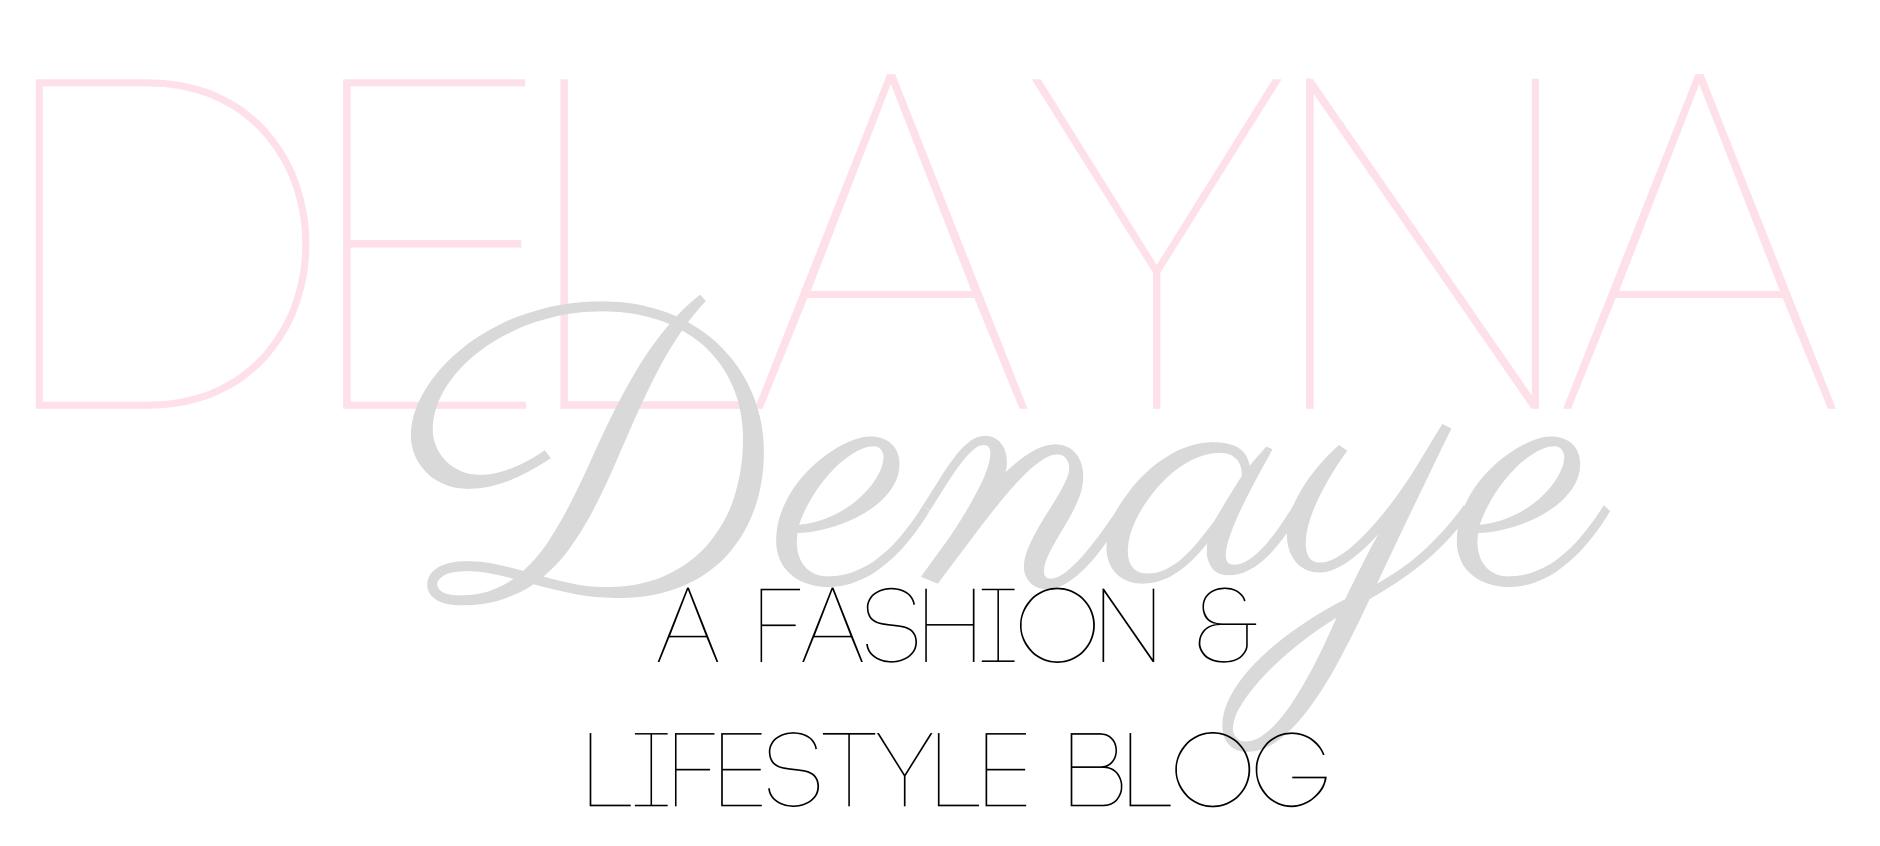 Header for blog.